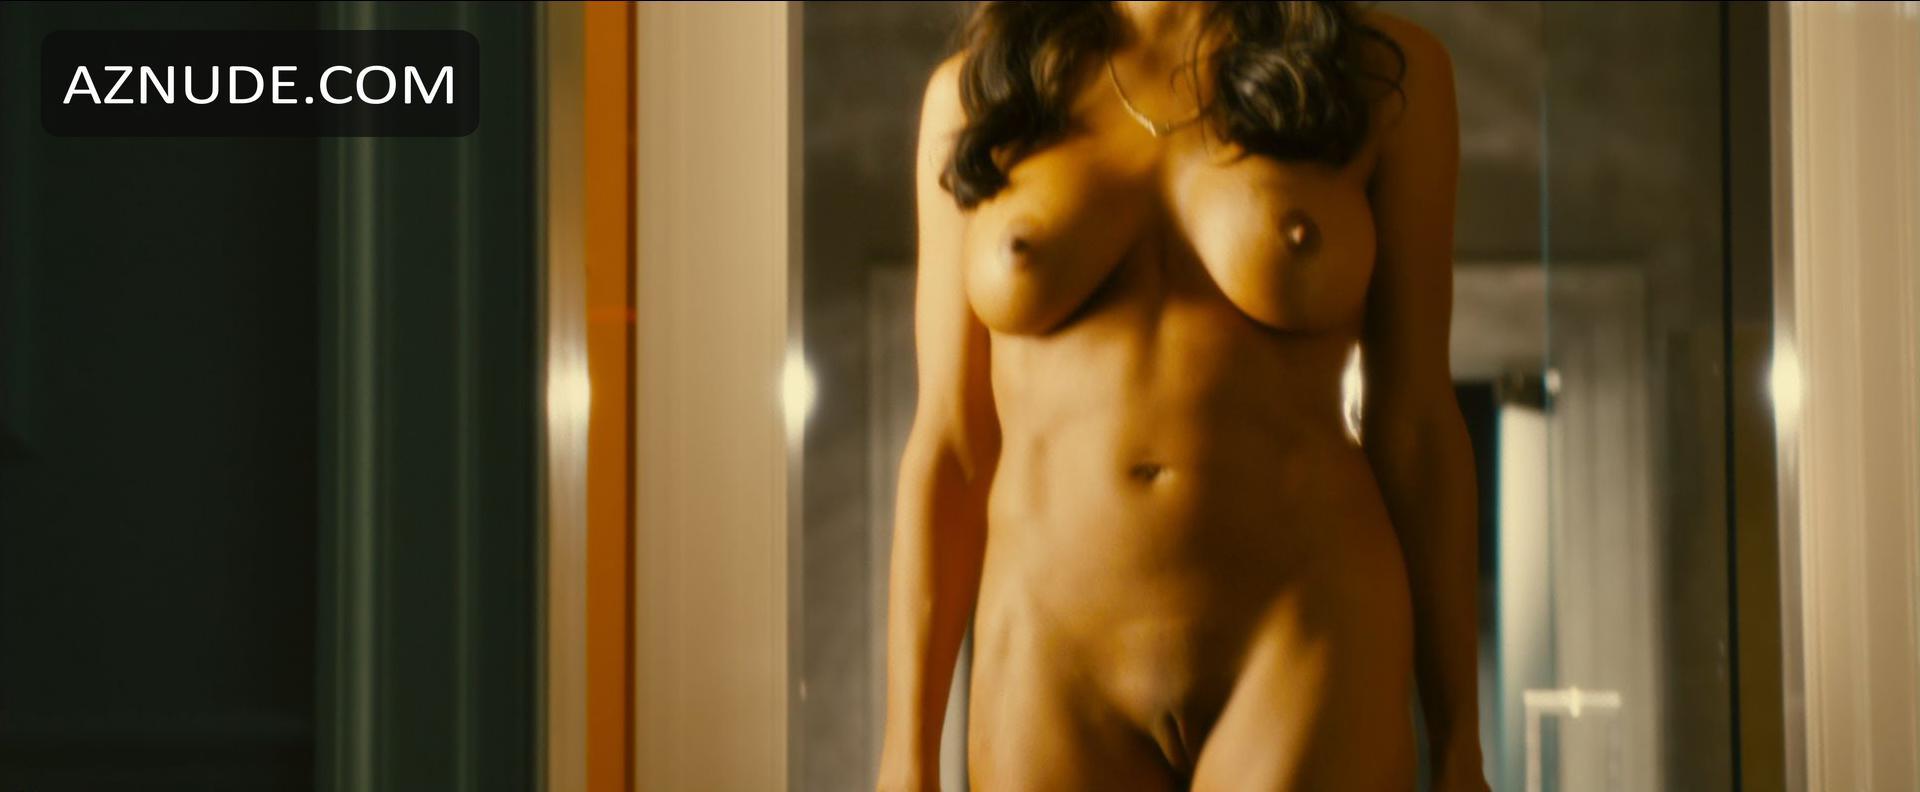 rosario dawson nude from the movie